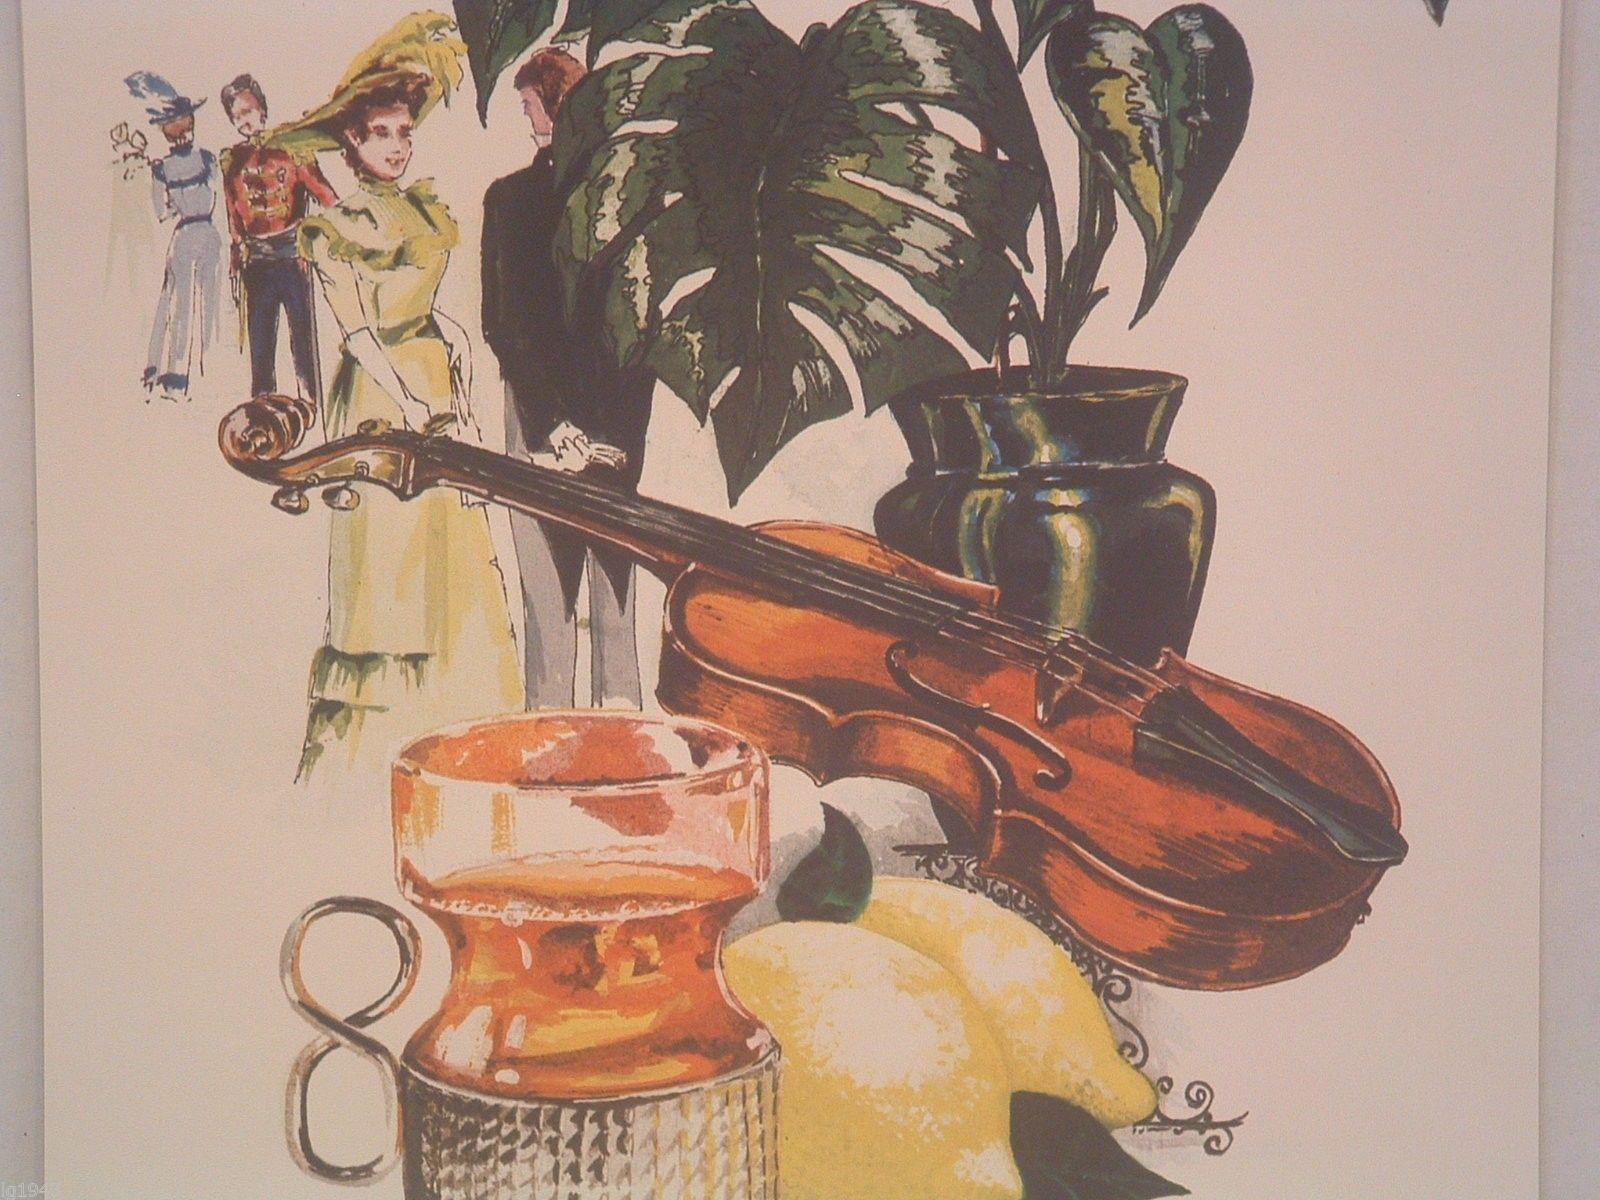 Lenier'sOrg. Green Rooibos South Africa Herbal Tea Tea 3oz Free Shipping